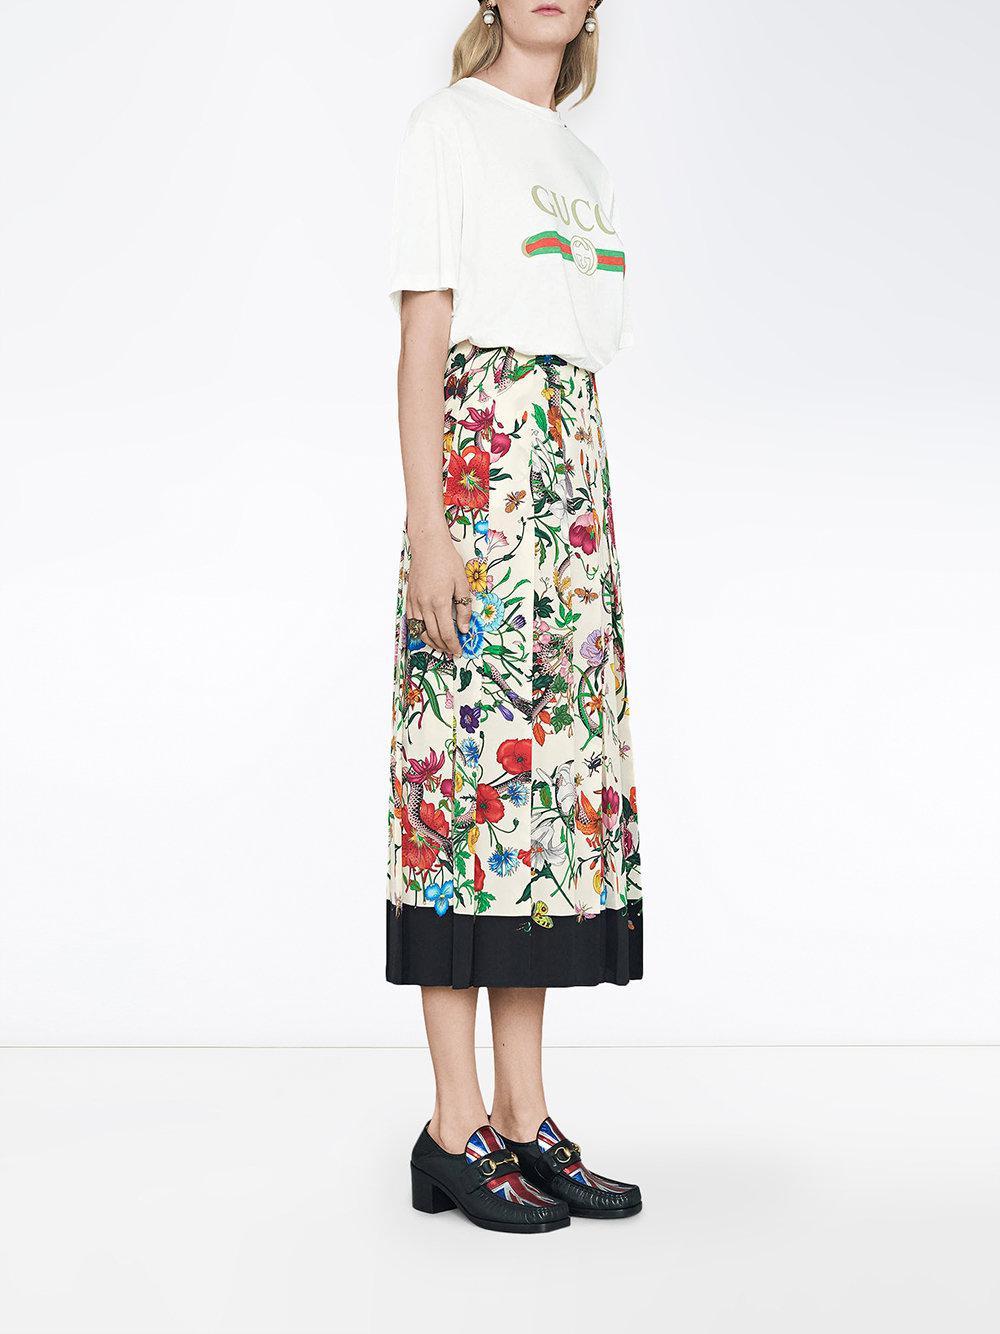 20fdb934eab Gucci Flora Snake Print Skirt - Lyst